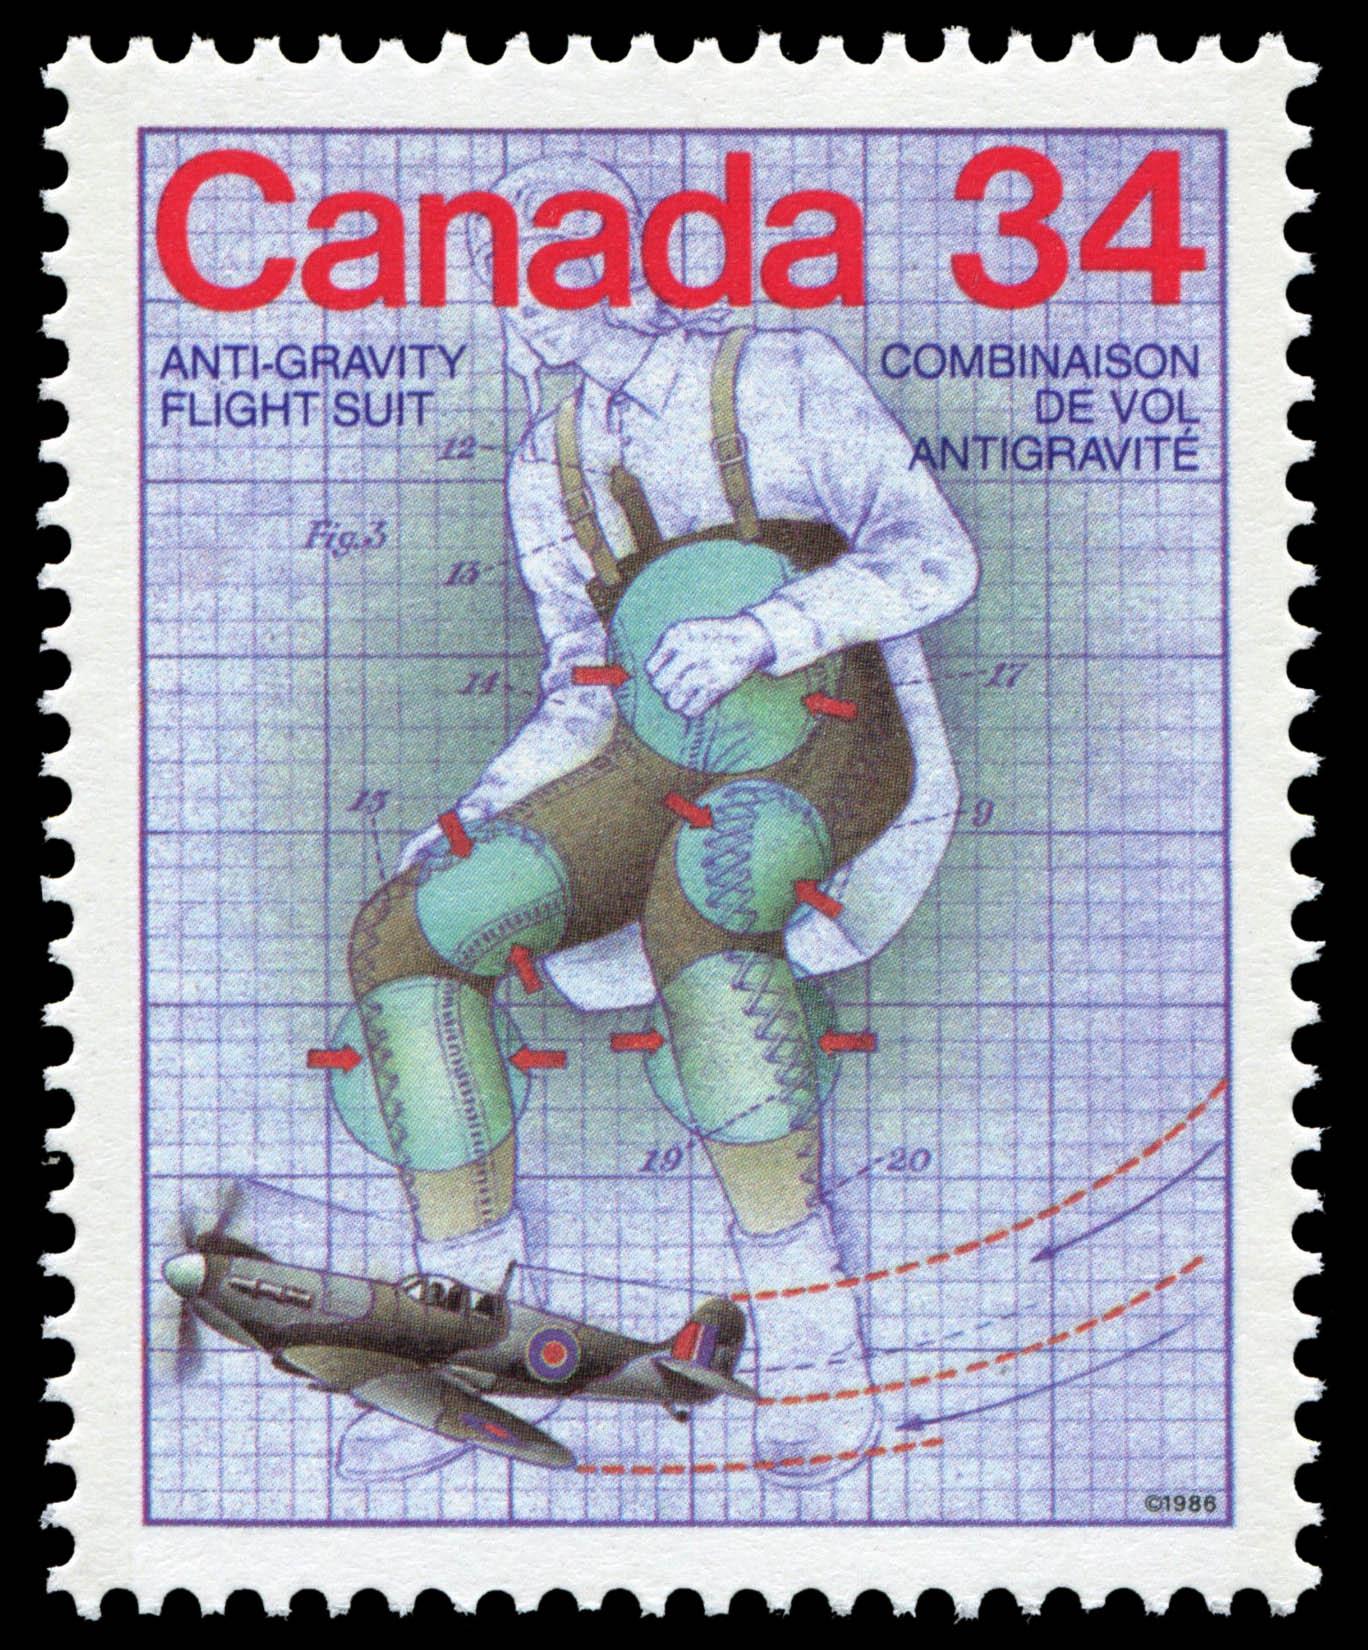 Anti-Gravity Flight Suit Canada Postage Stamp